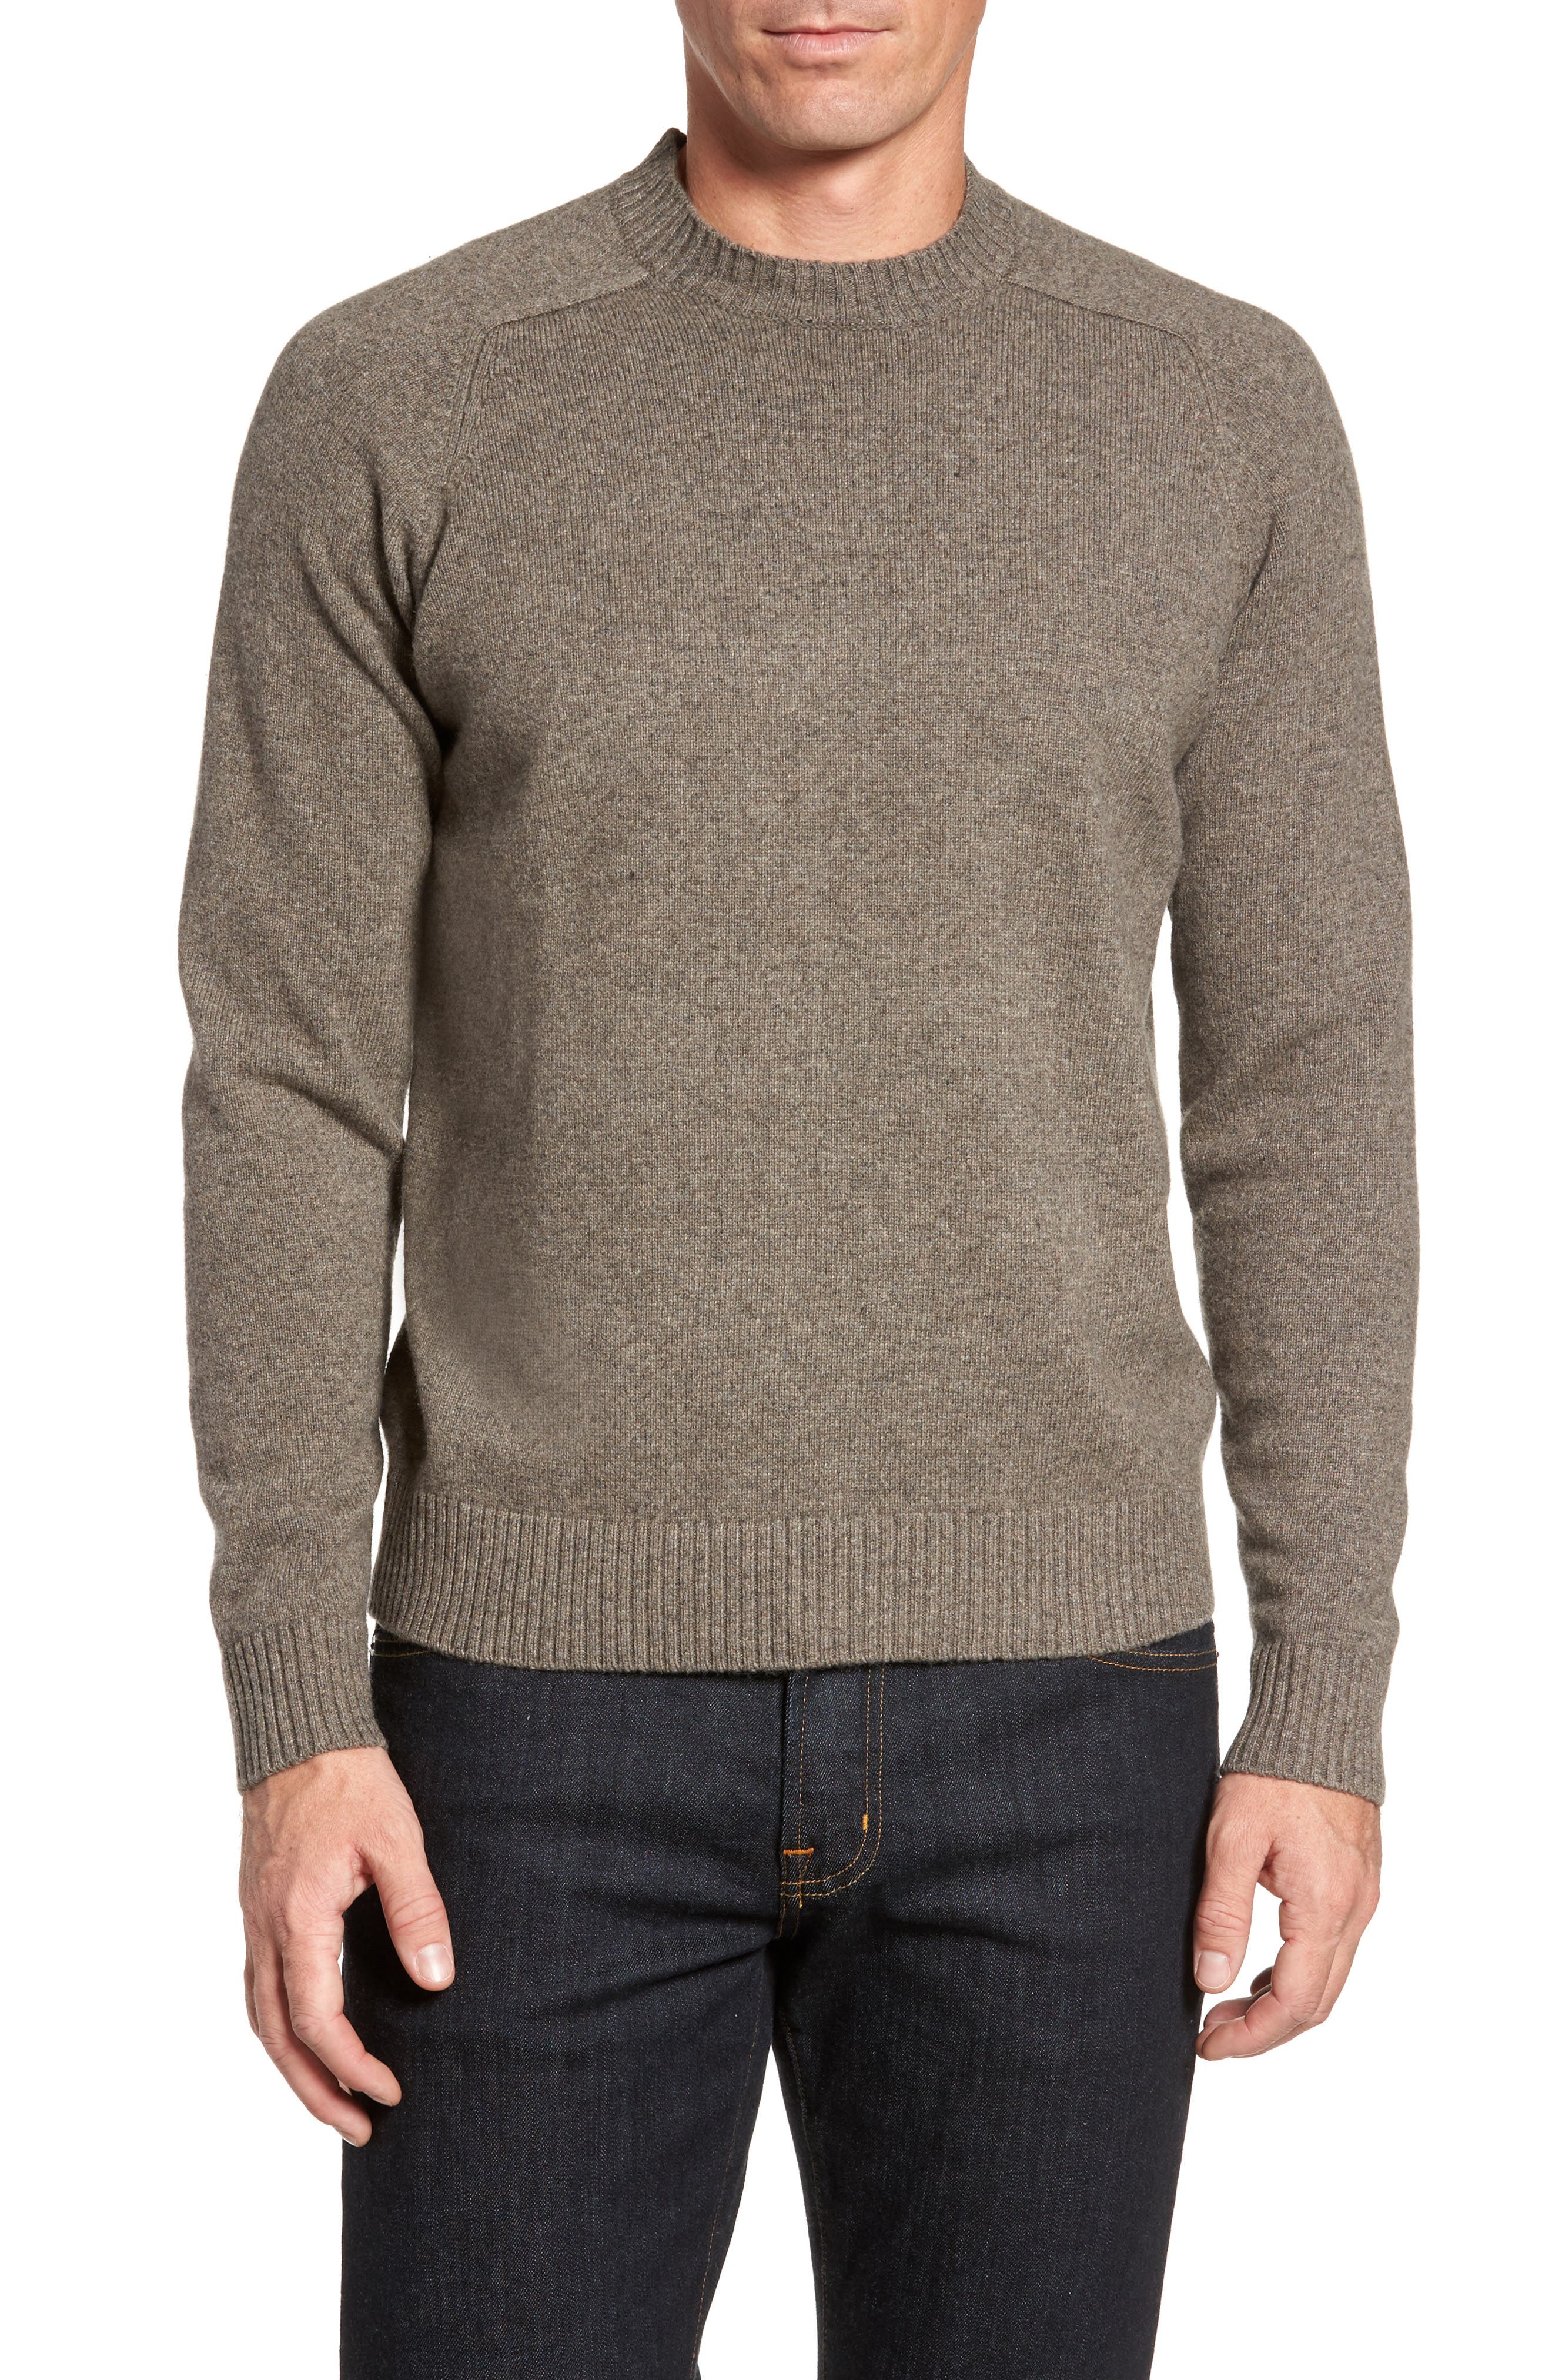 Crown Vintage Crewneck Sweatshirt,                             Main thumbnail 1, color,                             199